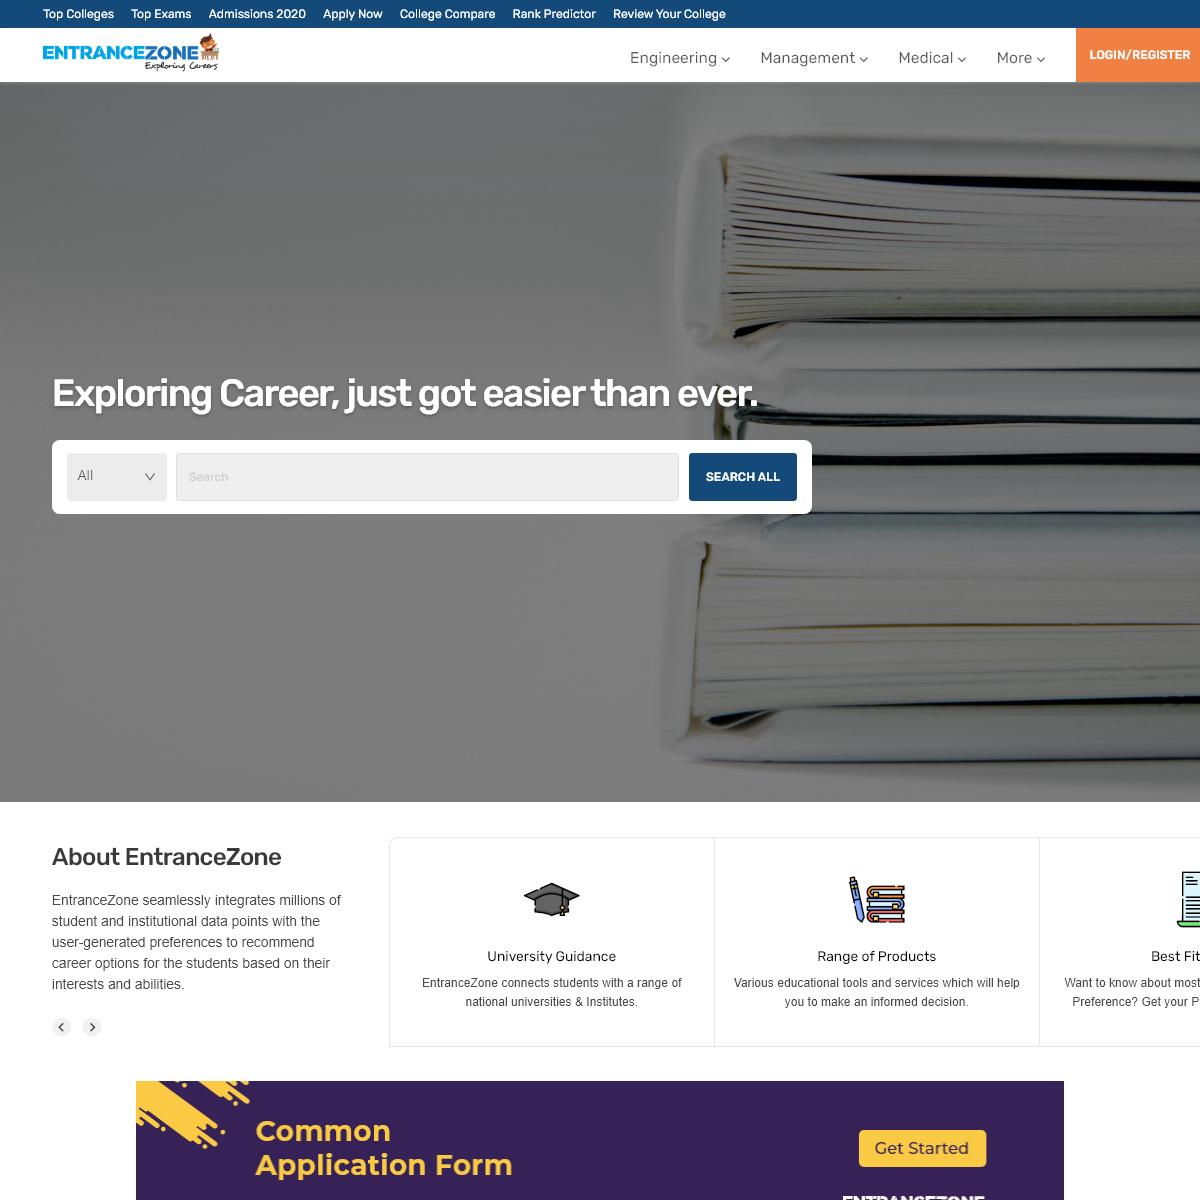 EntranceZone- Exploring Careers KG to PhD